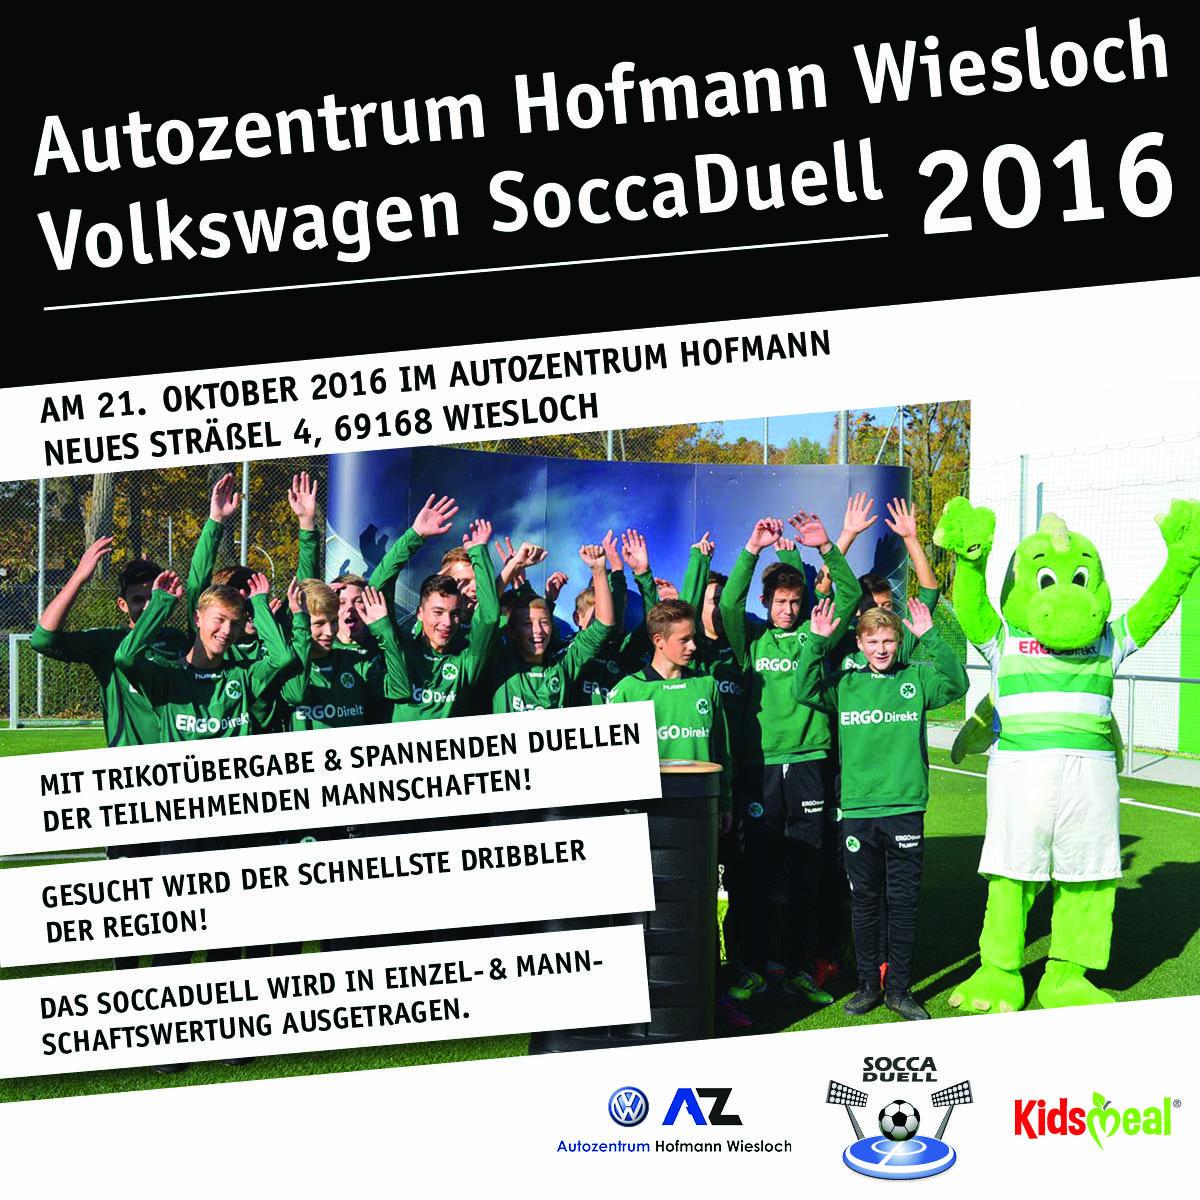 Volkswagen SoccaDuell-Meisterschaft Wiesloch 2016!